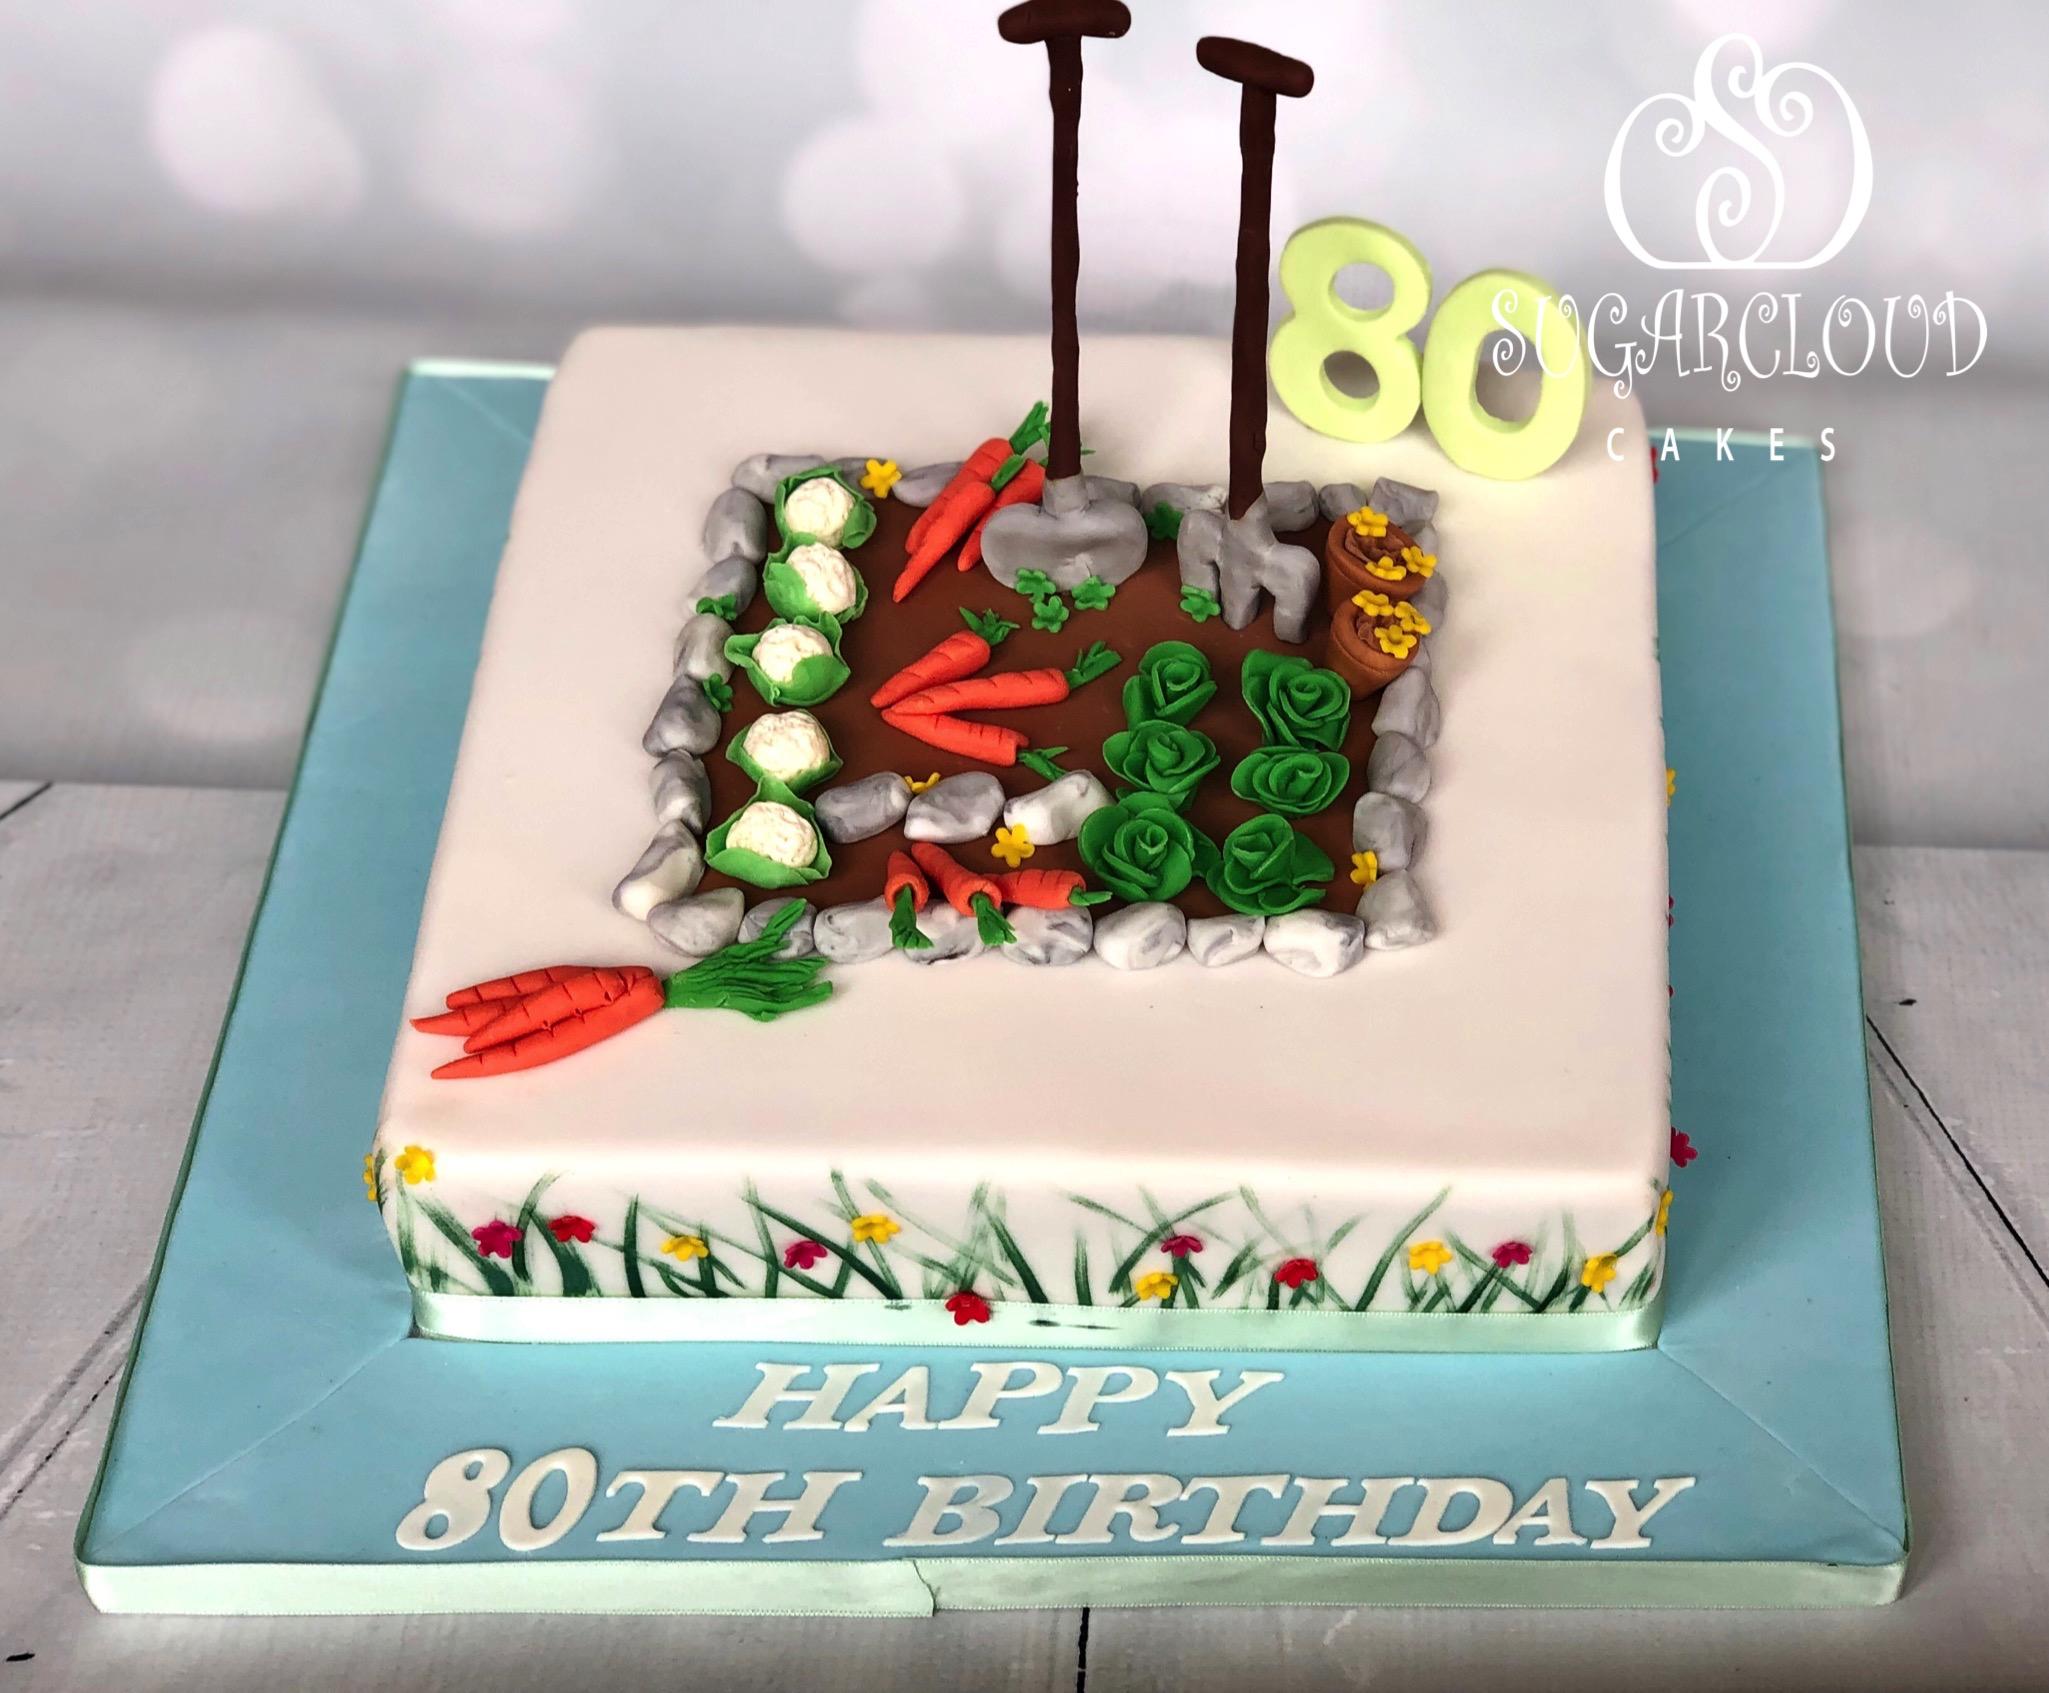 An 80th Birthday Cake for a Keen Gardener, Crewe